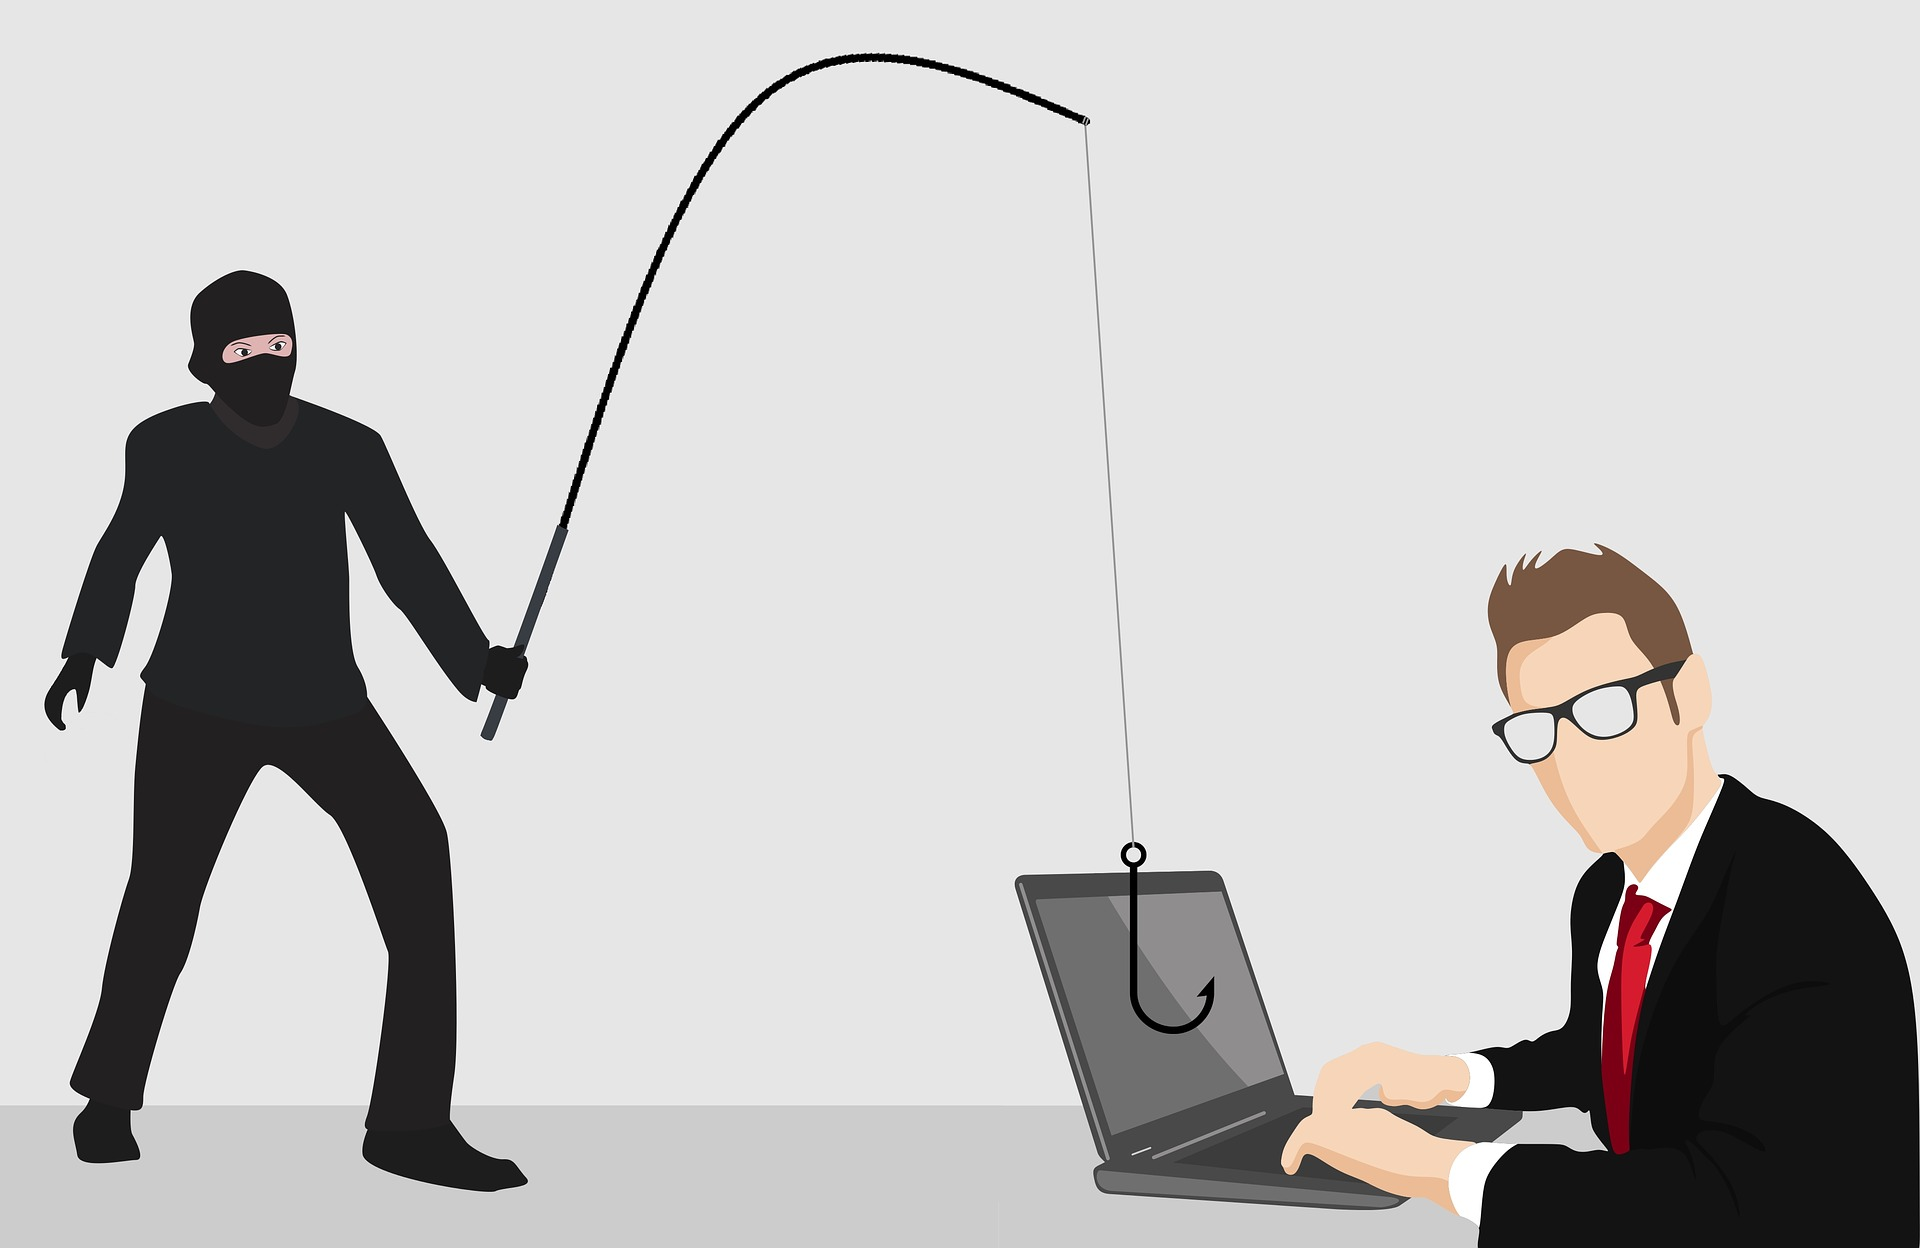 Beware of Amazon Account Phishing Scams